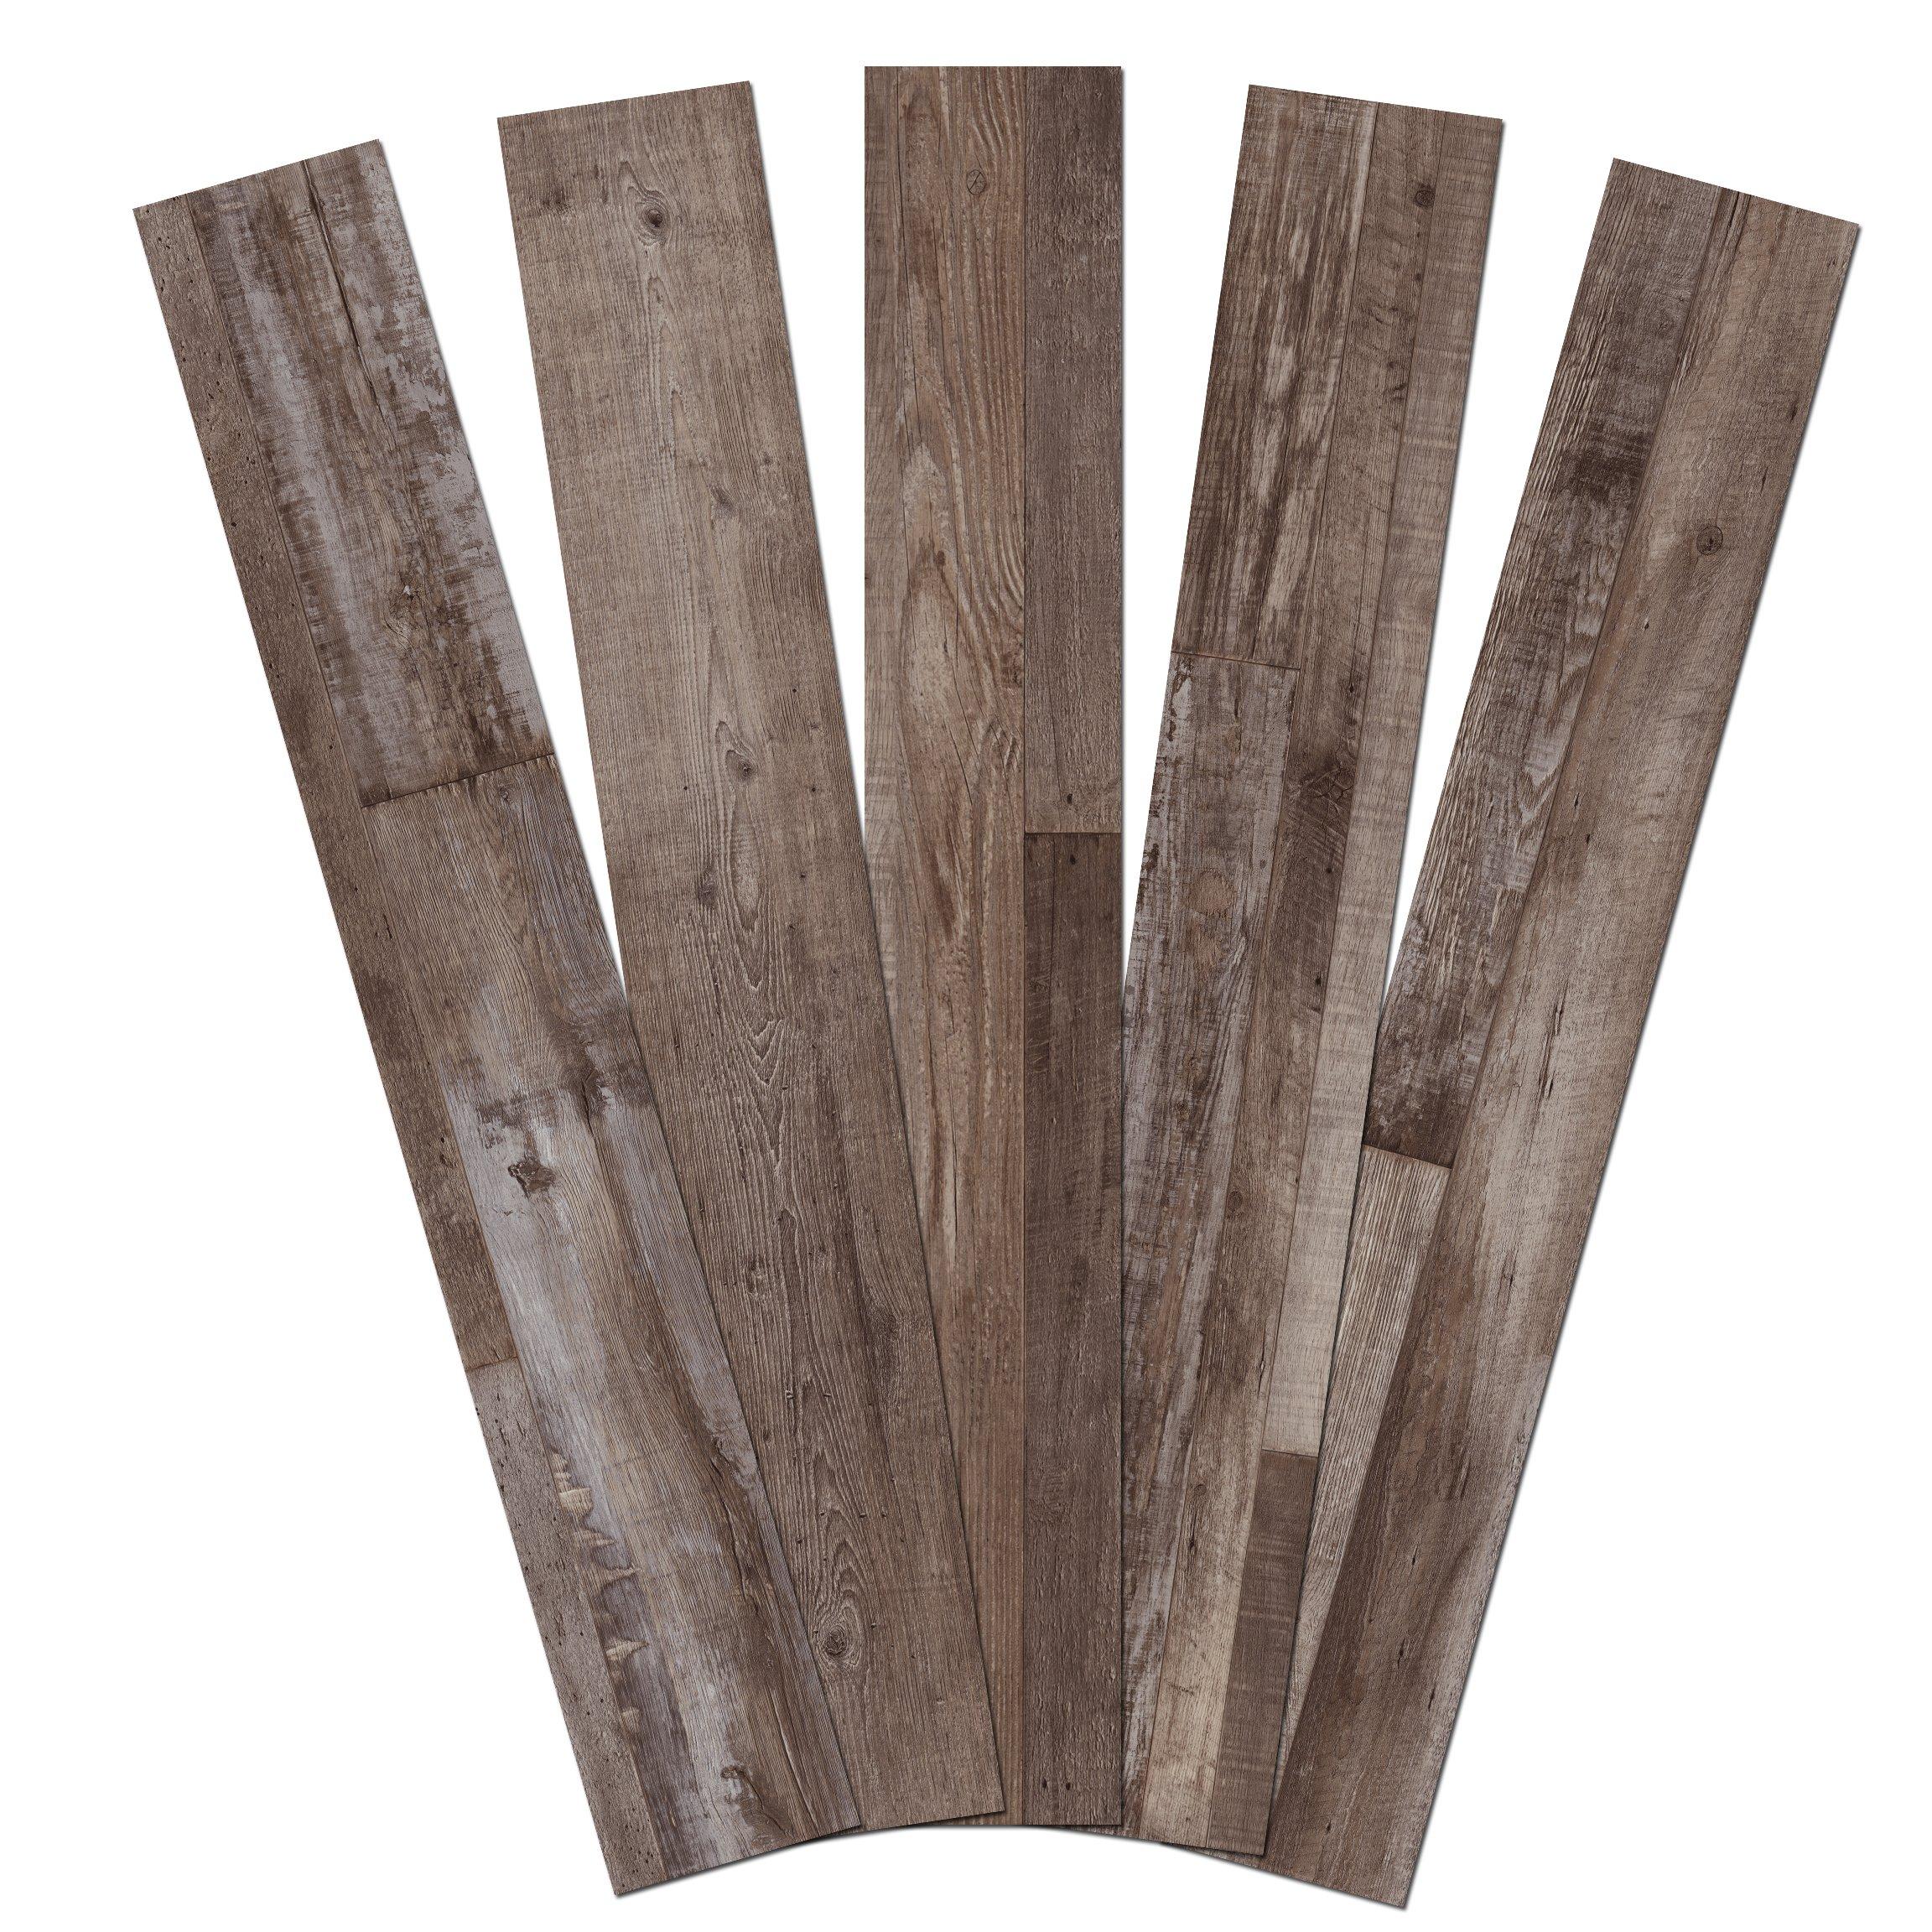 Admira Collection 10 Pack 6.5Mm Stone Core Engineered Vinyl Plank Flooring, 48'' x 7'', Wood Grain Finish/Heirloom Gray, 23 sq. ft